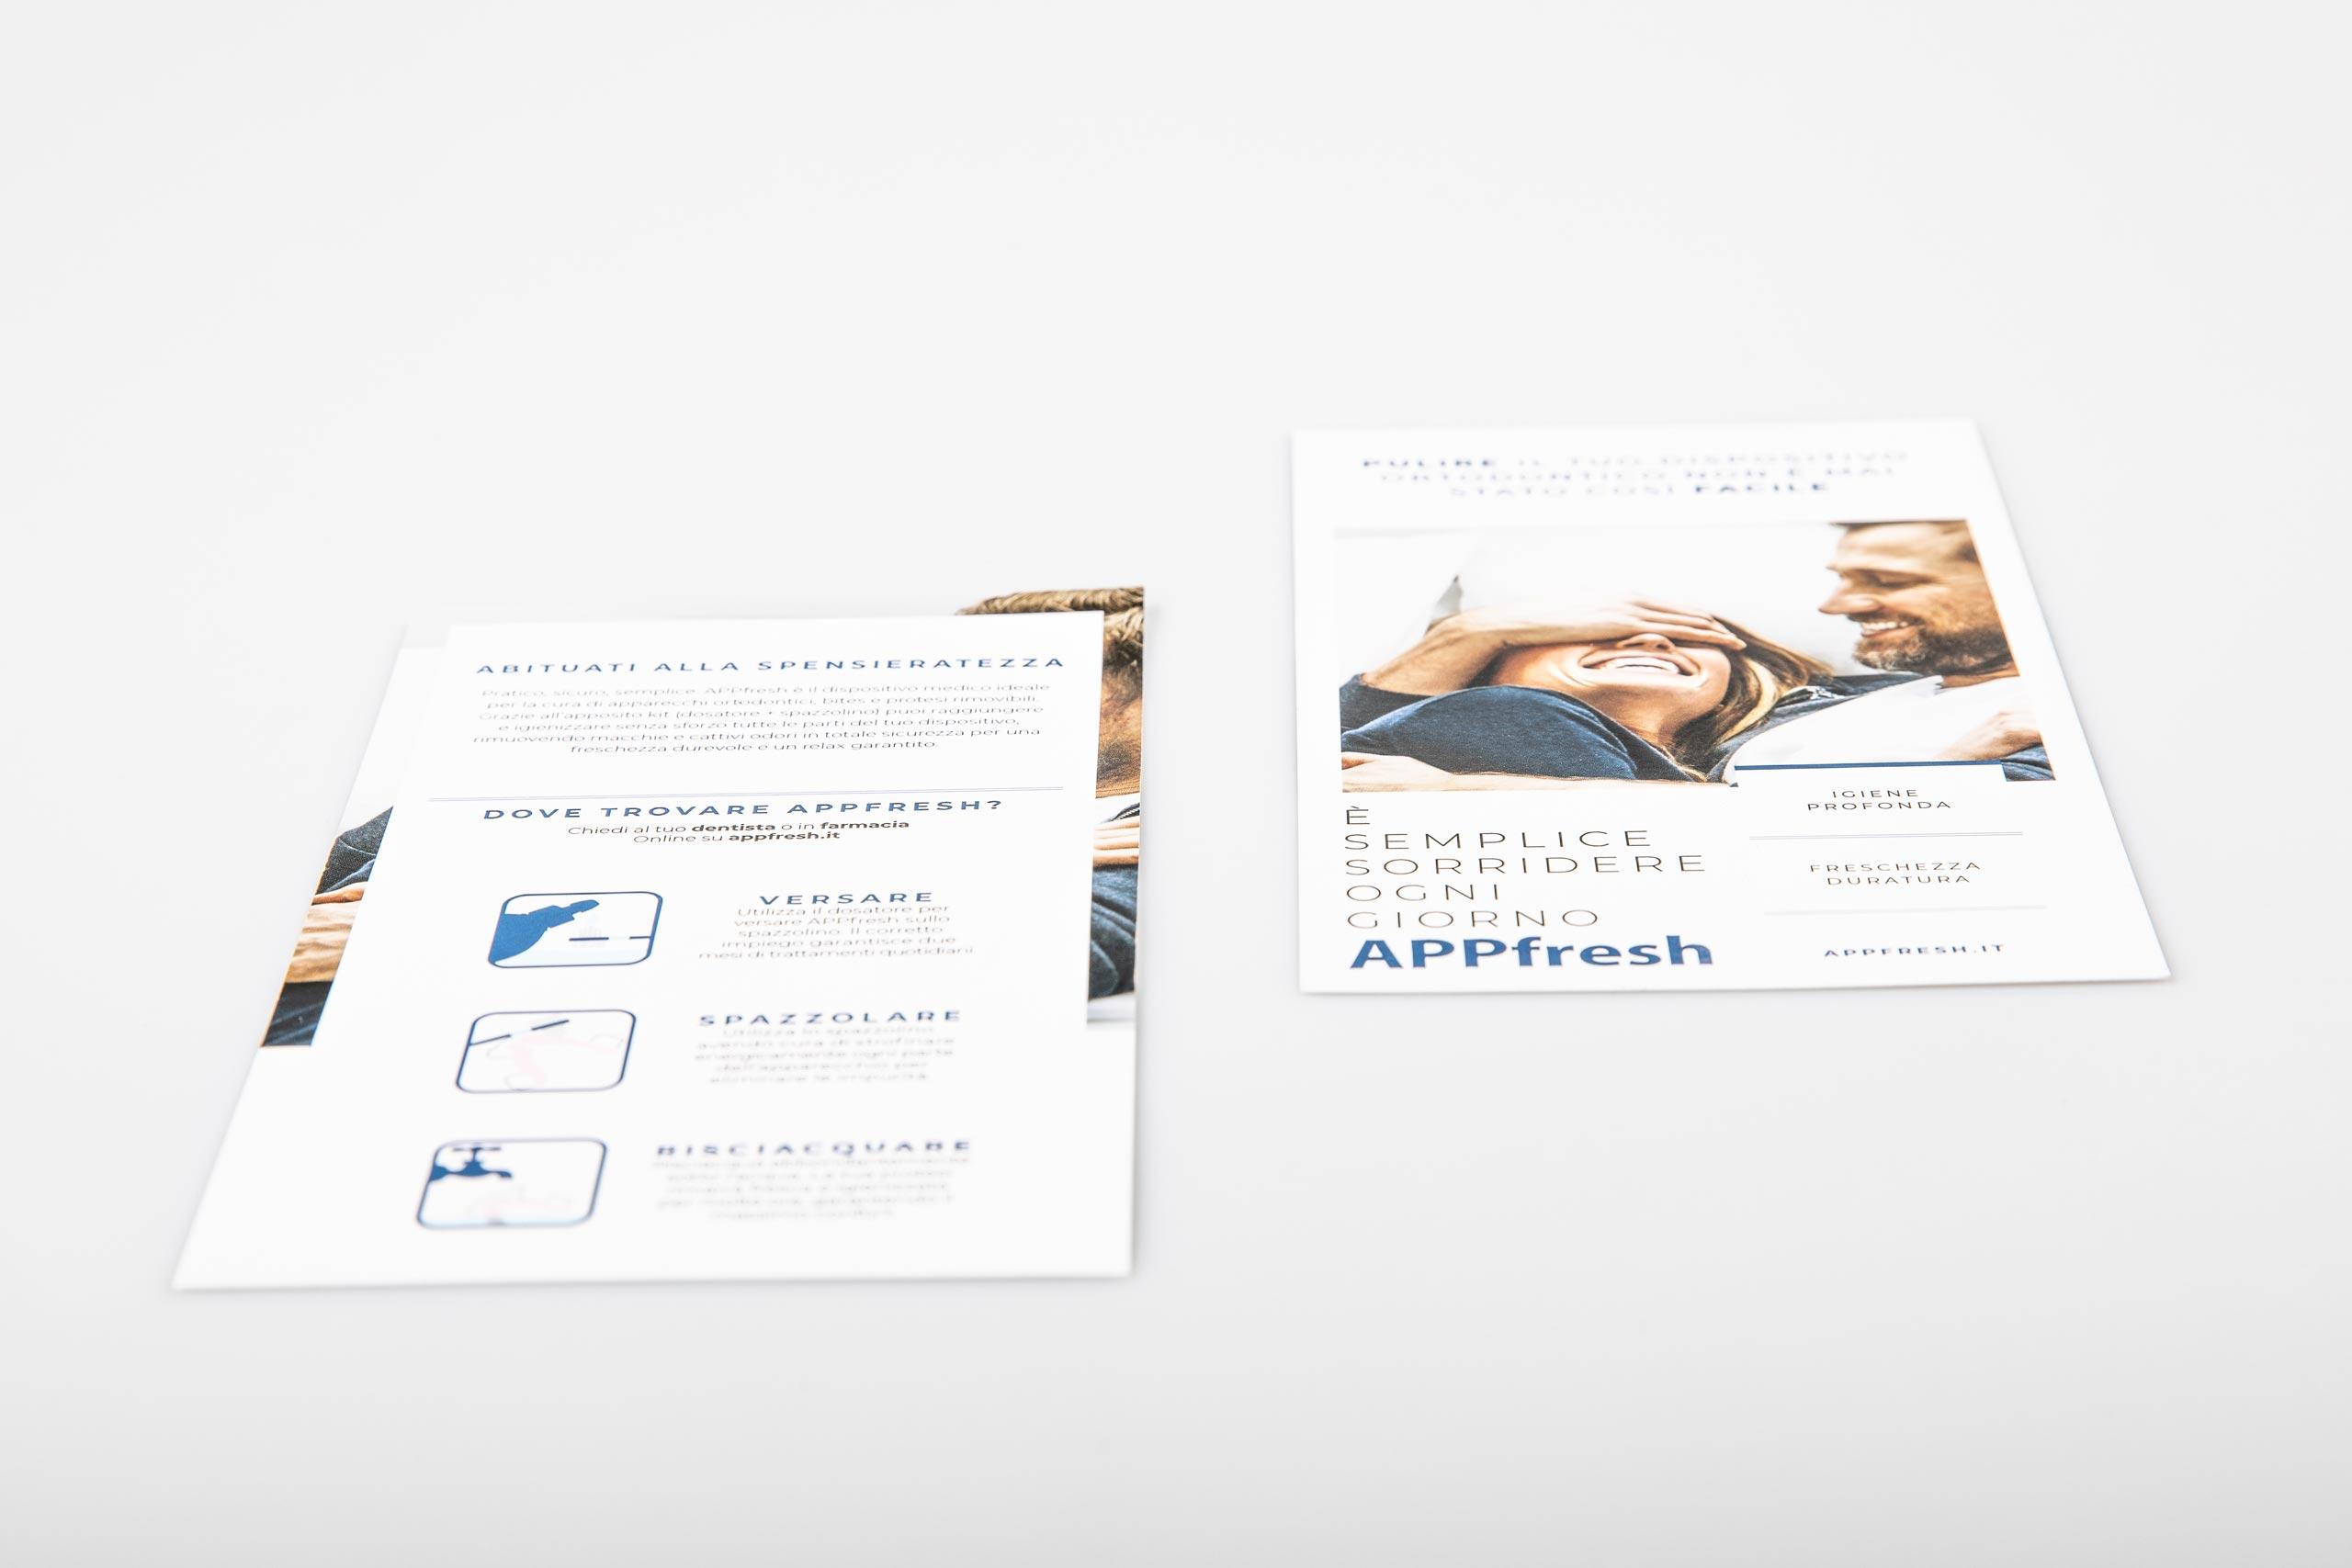 bouncy-particle-comunicazione-marketing-appfresh